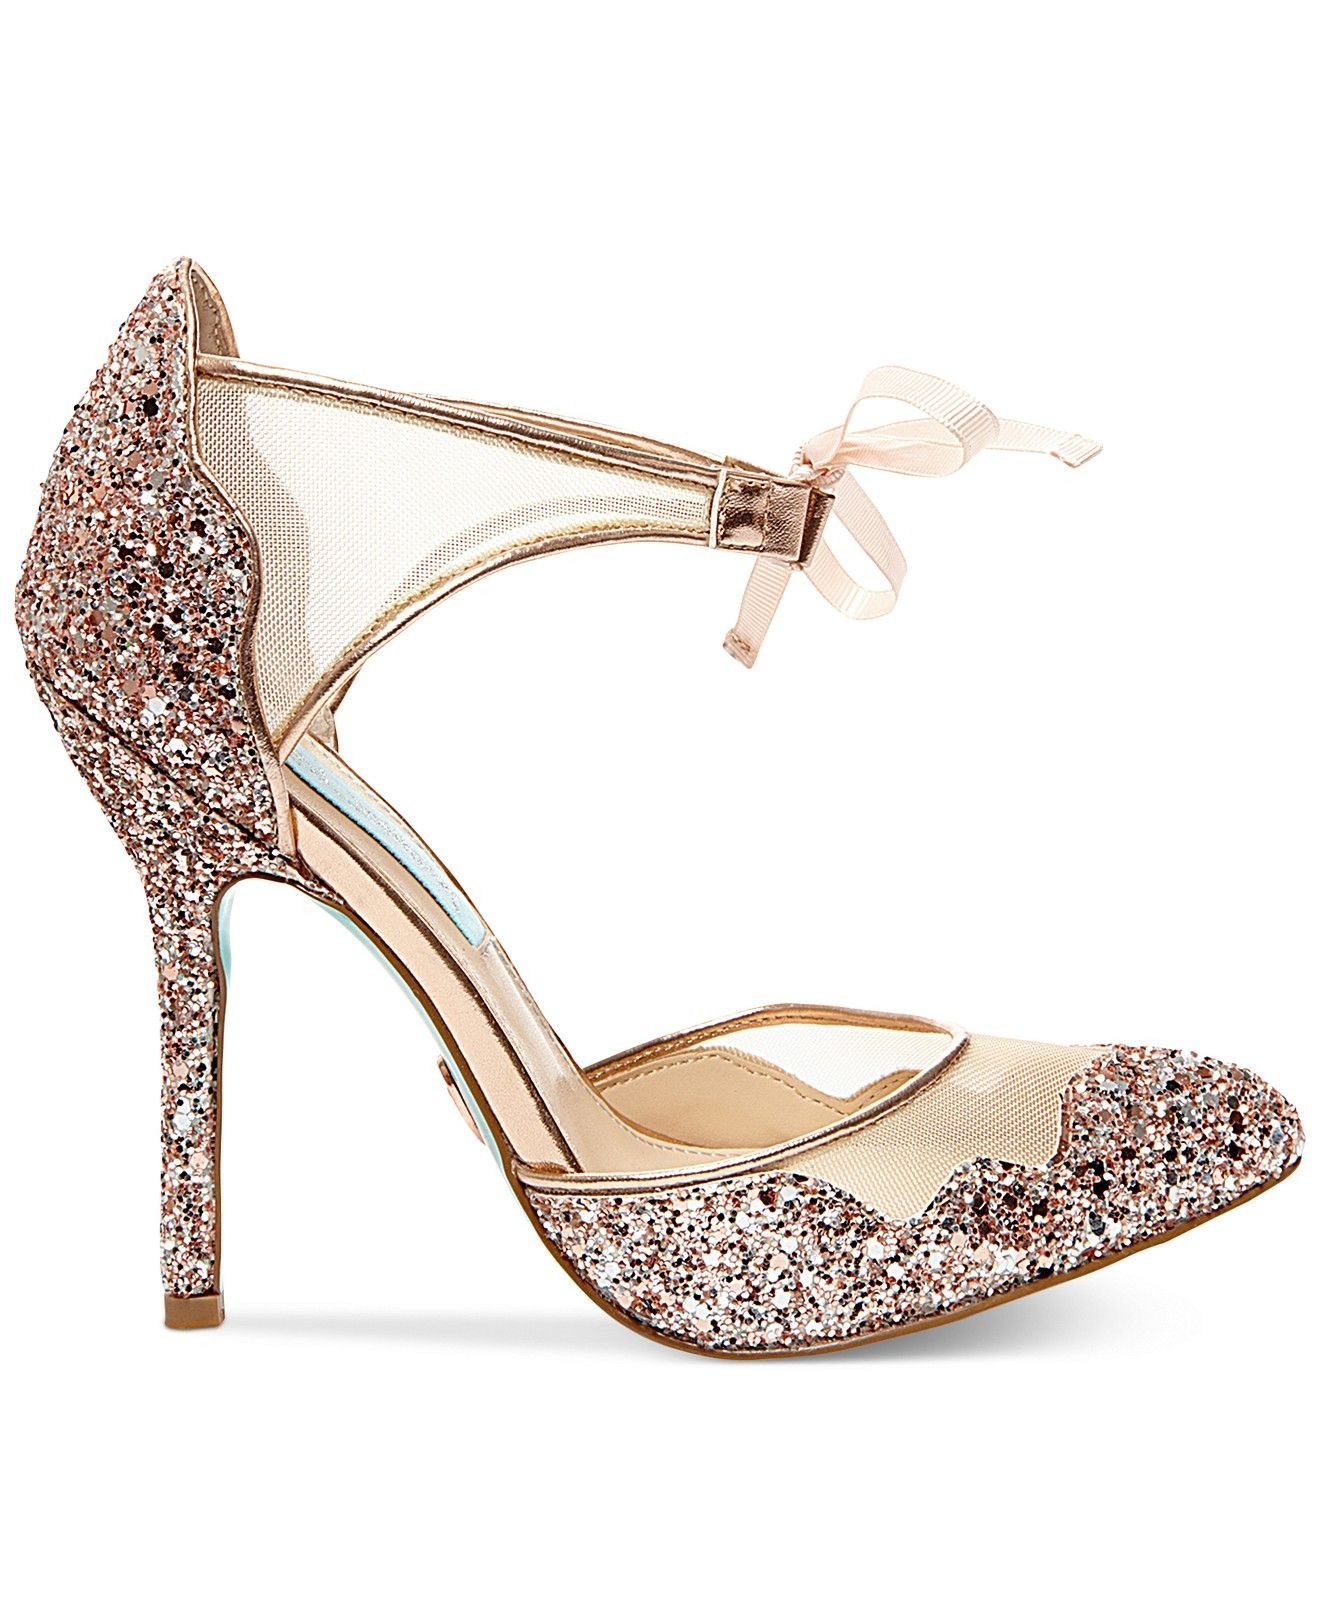 Betsey Johnson Wedding Shoes Wedding Shoes Macys Blue By Betsey Johnson Stela Evening Sandals In 2020 Betsey Johnson Wedding Shoes Bridal Shoes Wedding Shoes